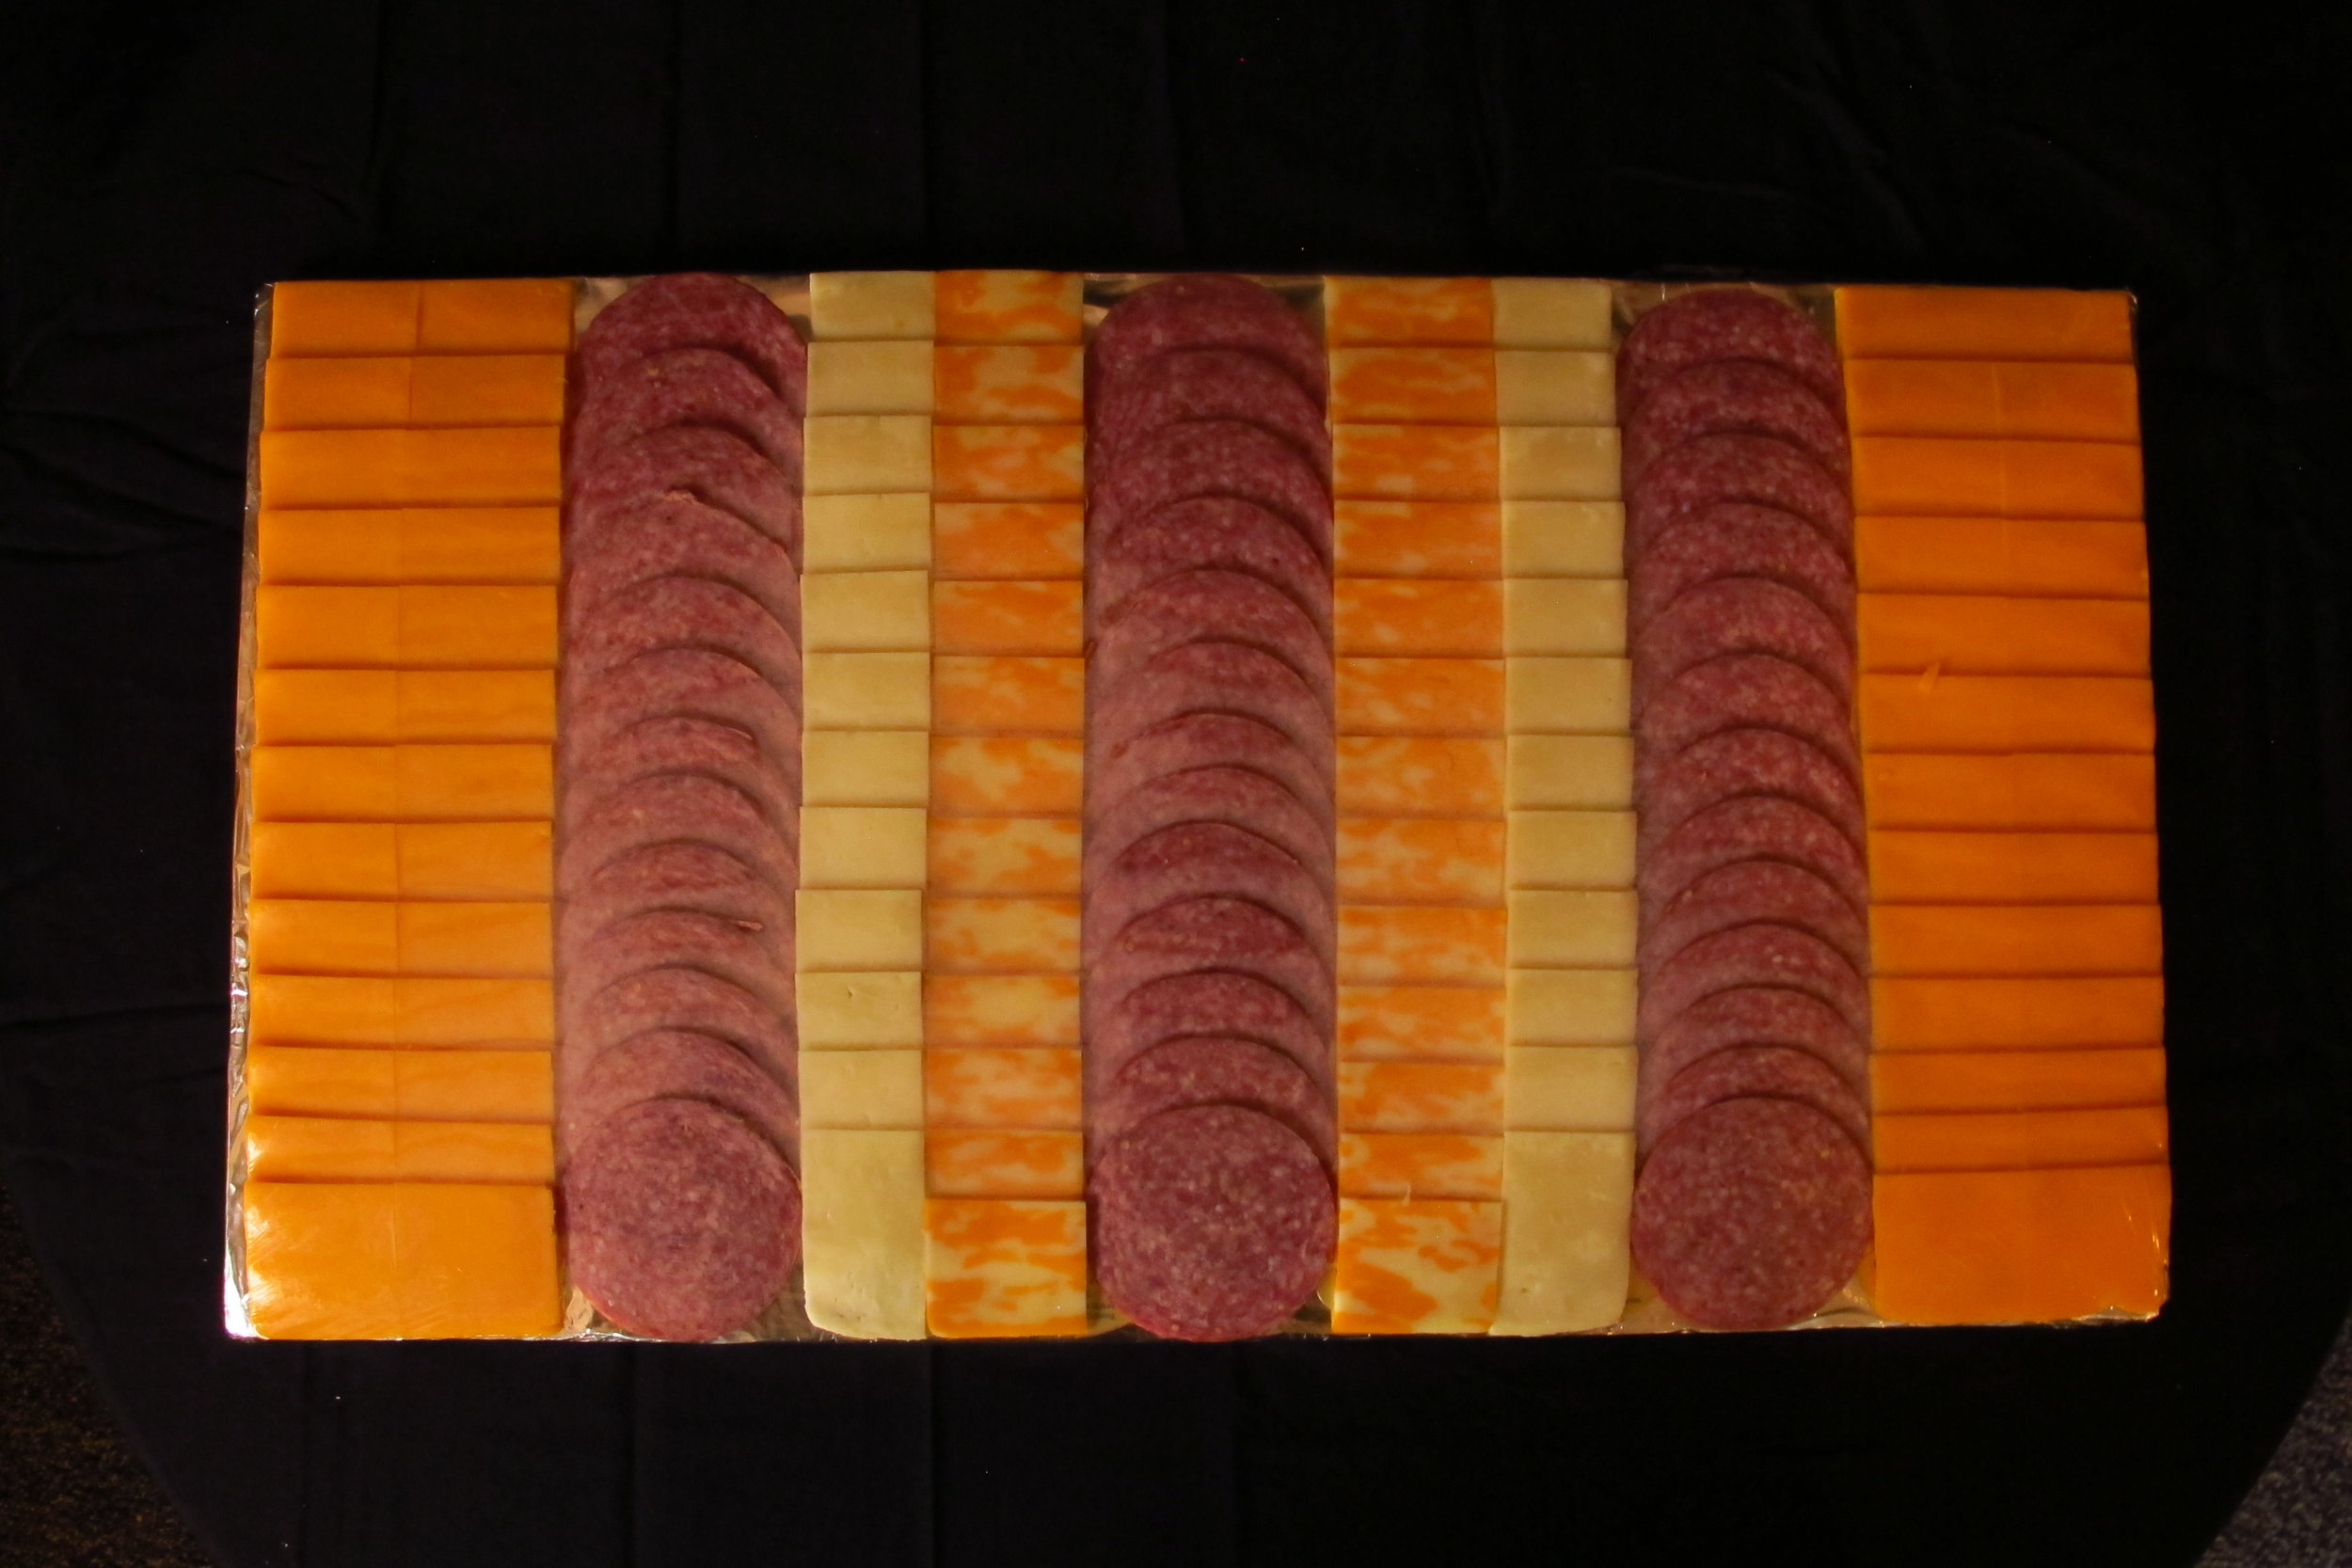 Medium Special Order Cheese & Sausage Tray